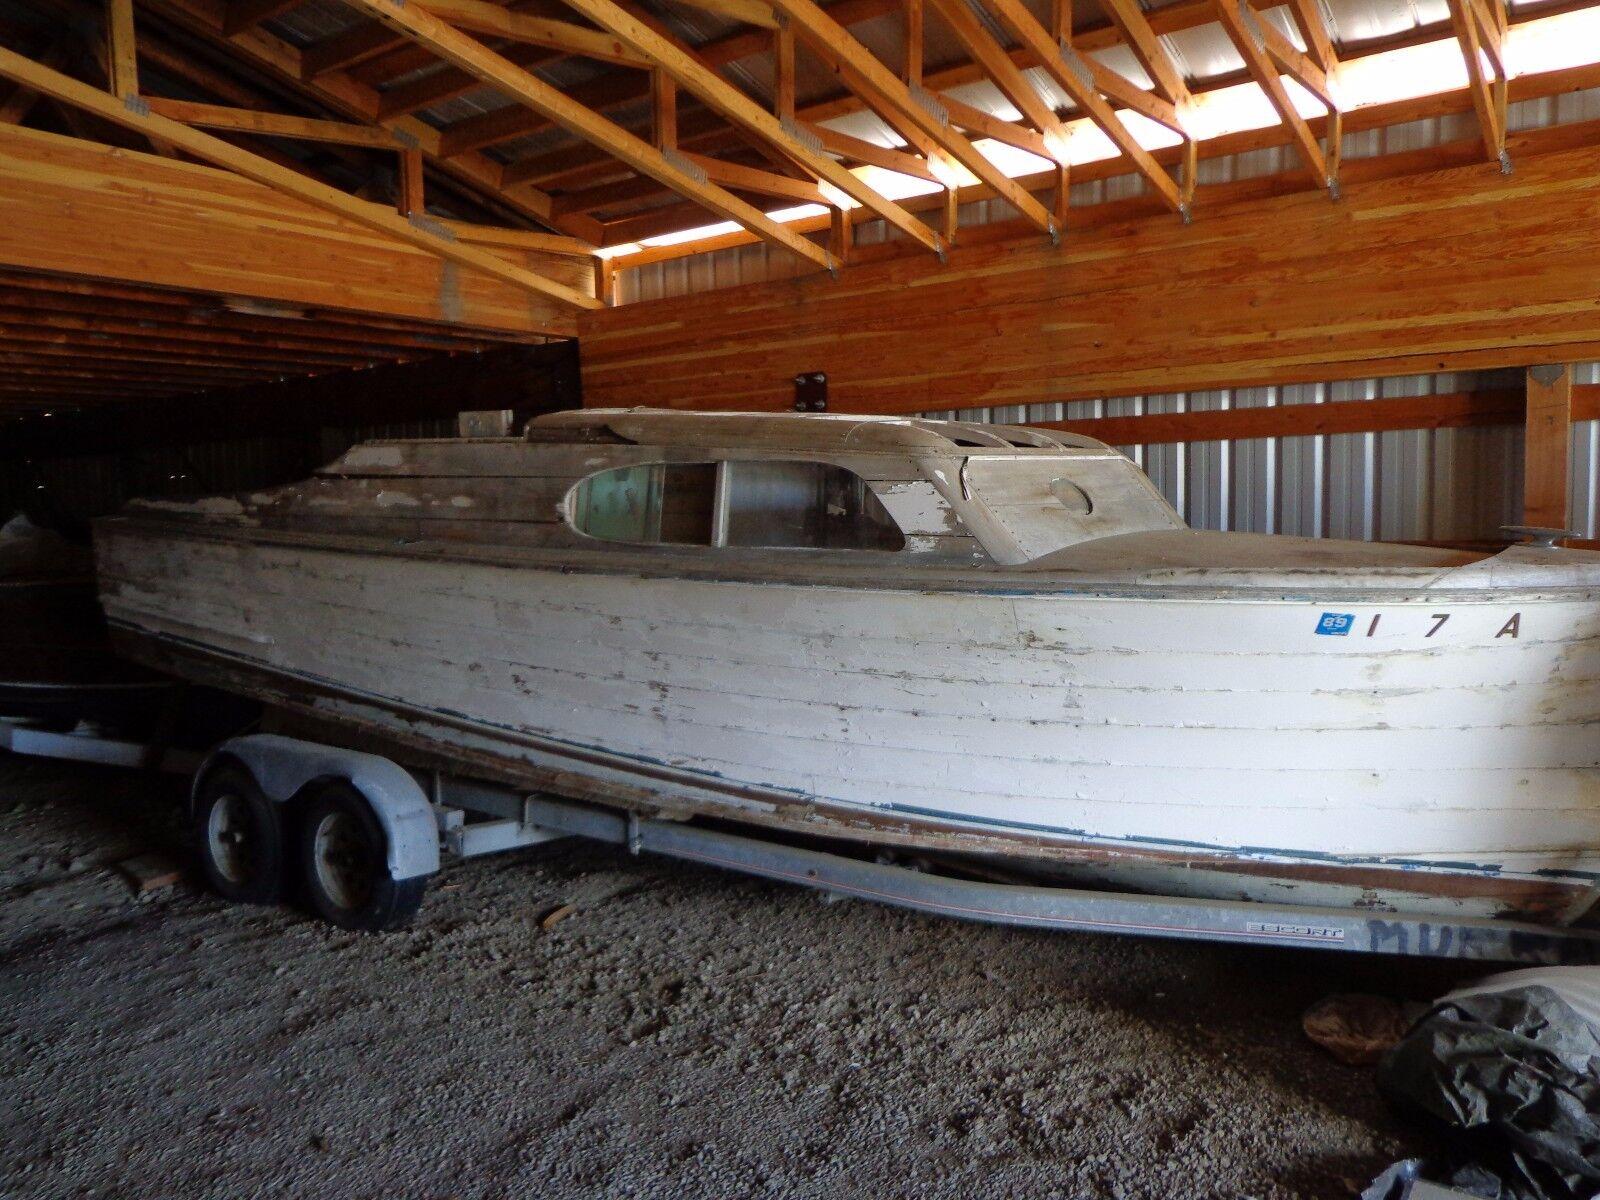 Chris Craft Express Cruiser  23' 1946 Wood Boat